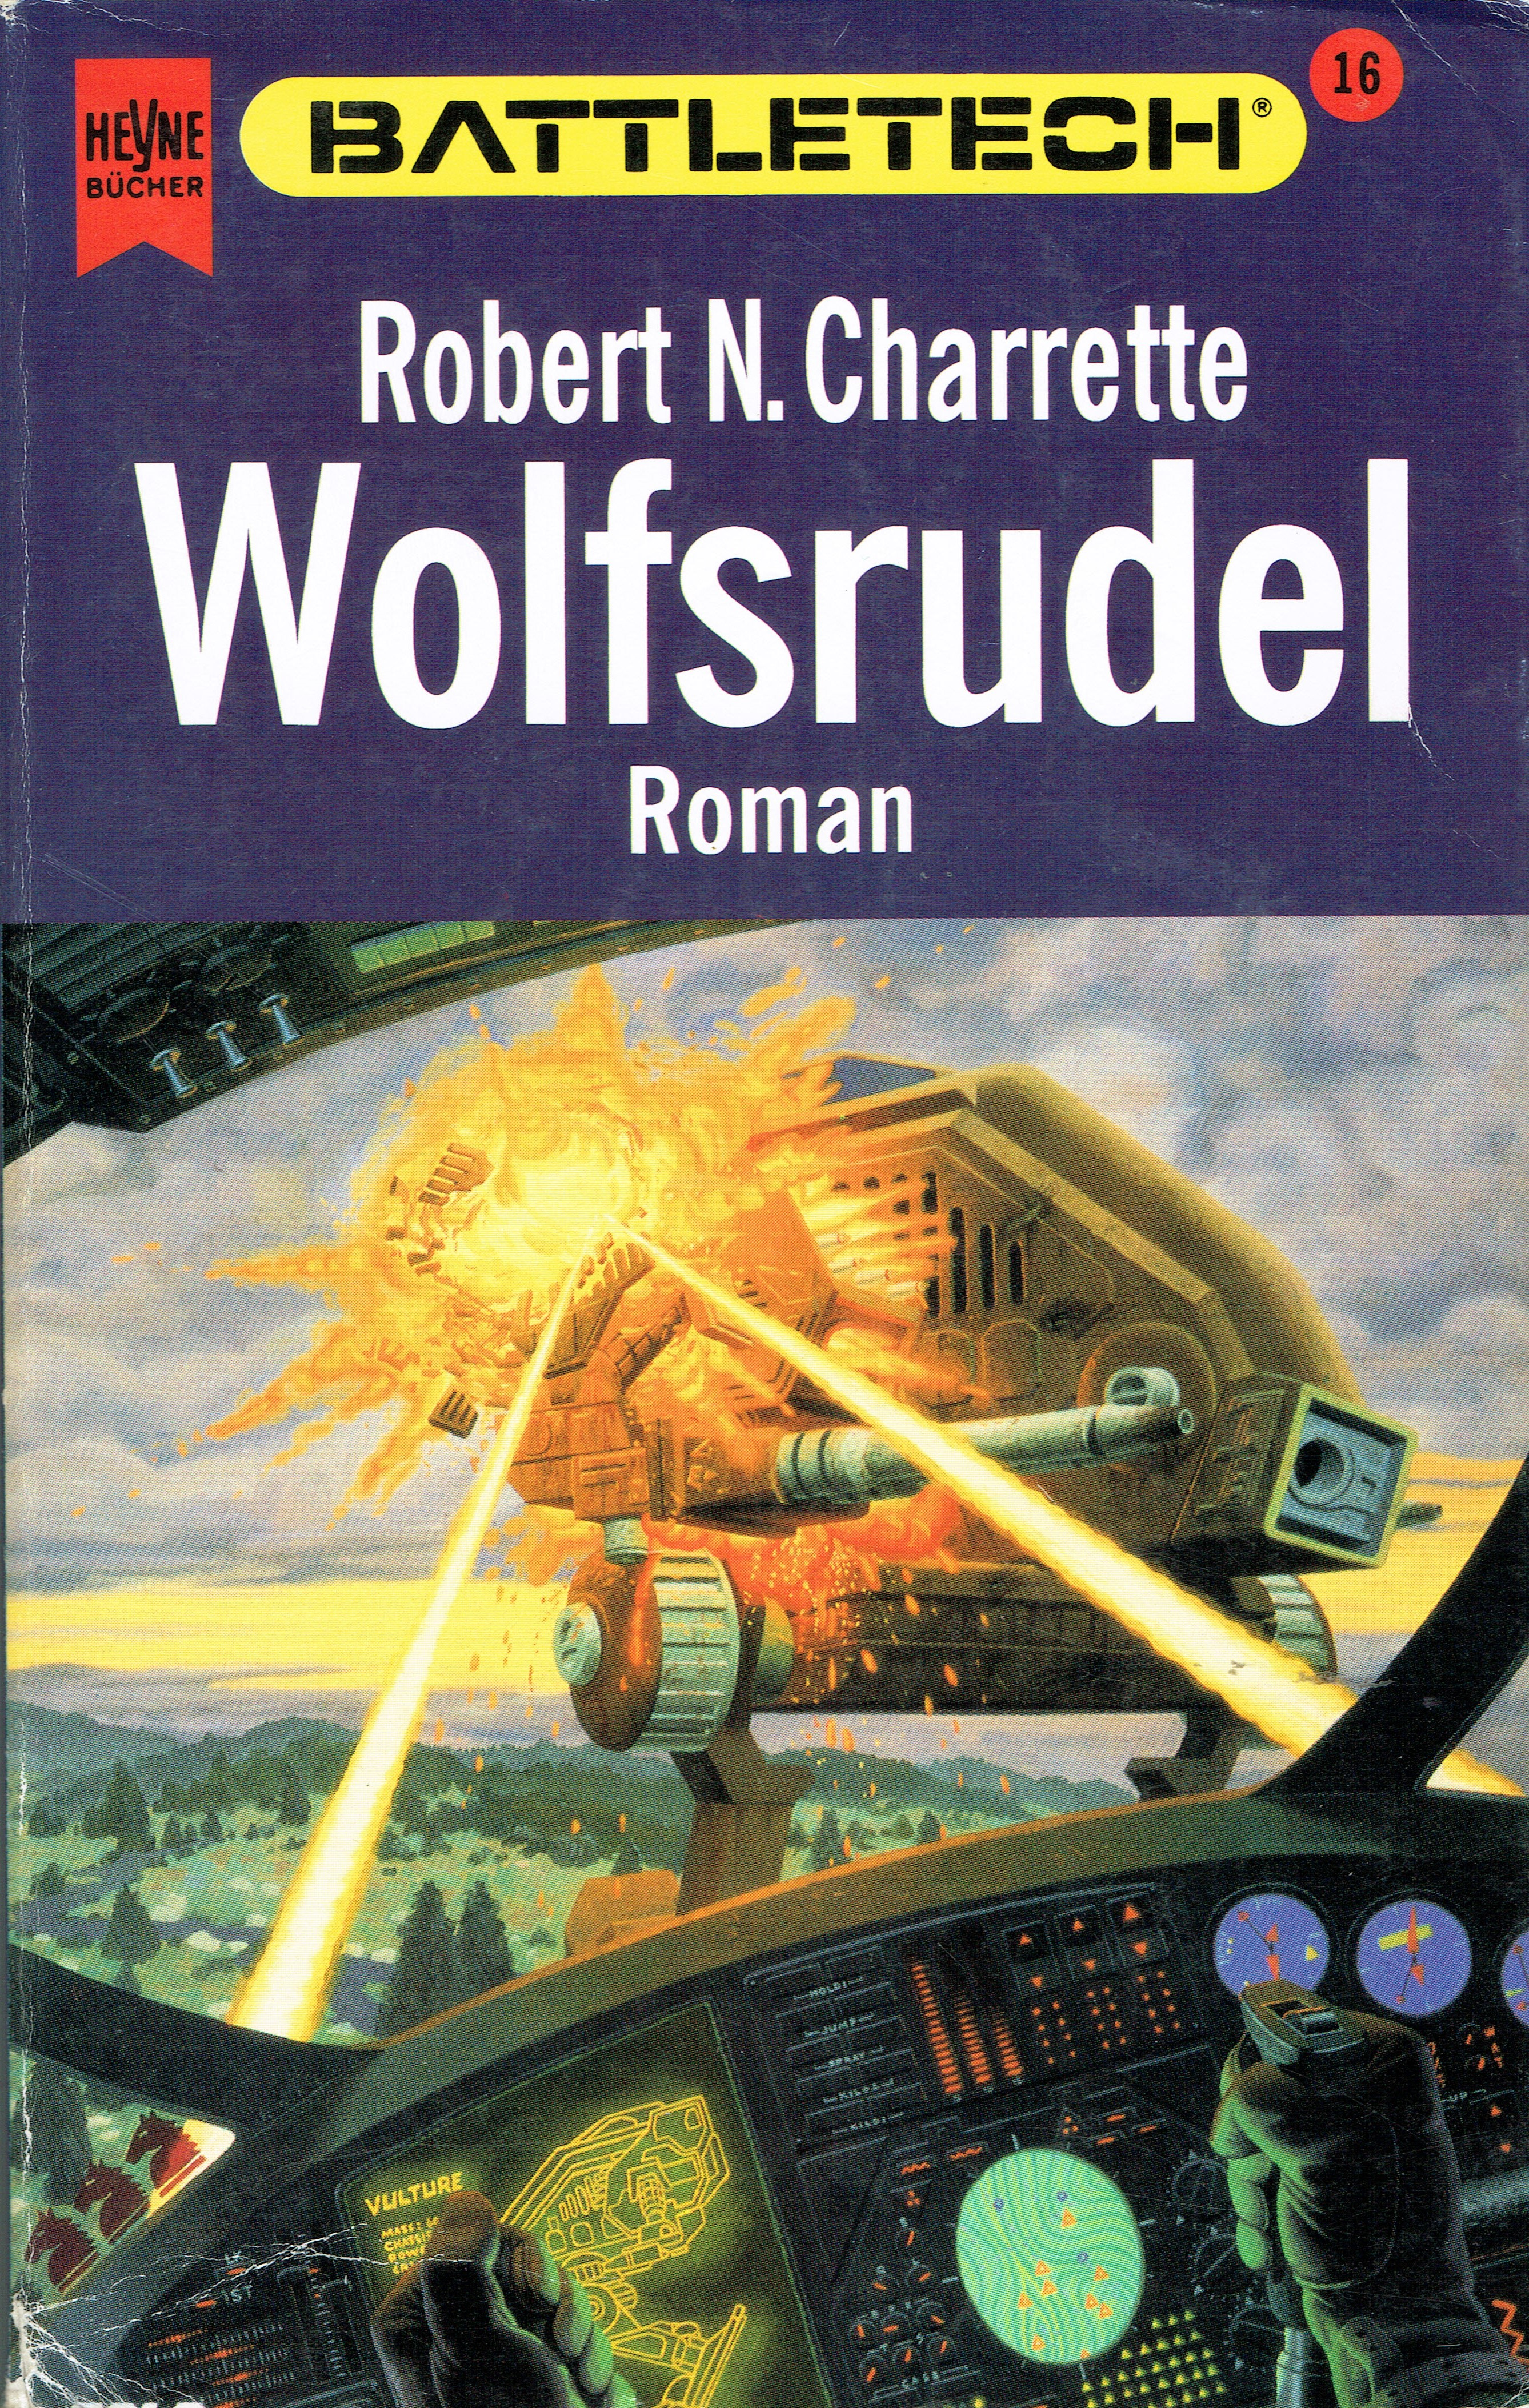 File:Wolfsrudel.jpg